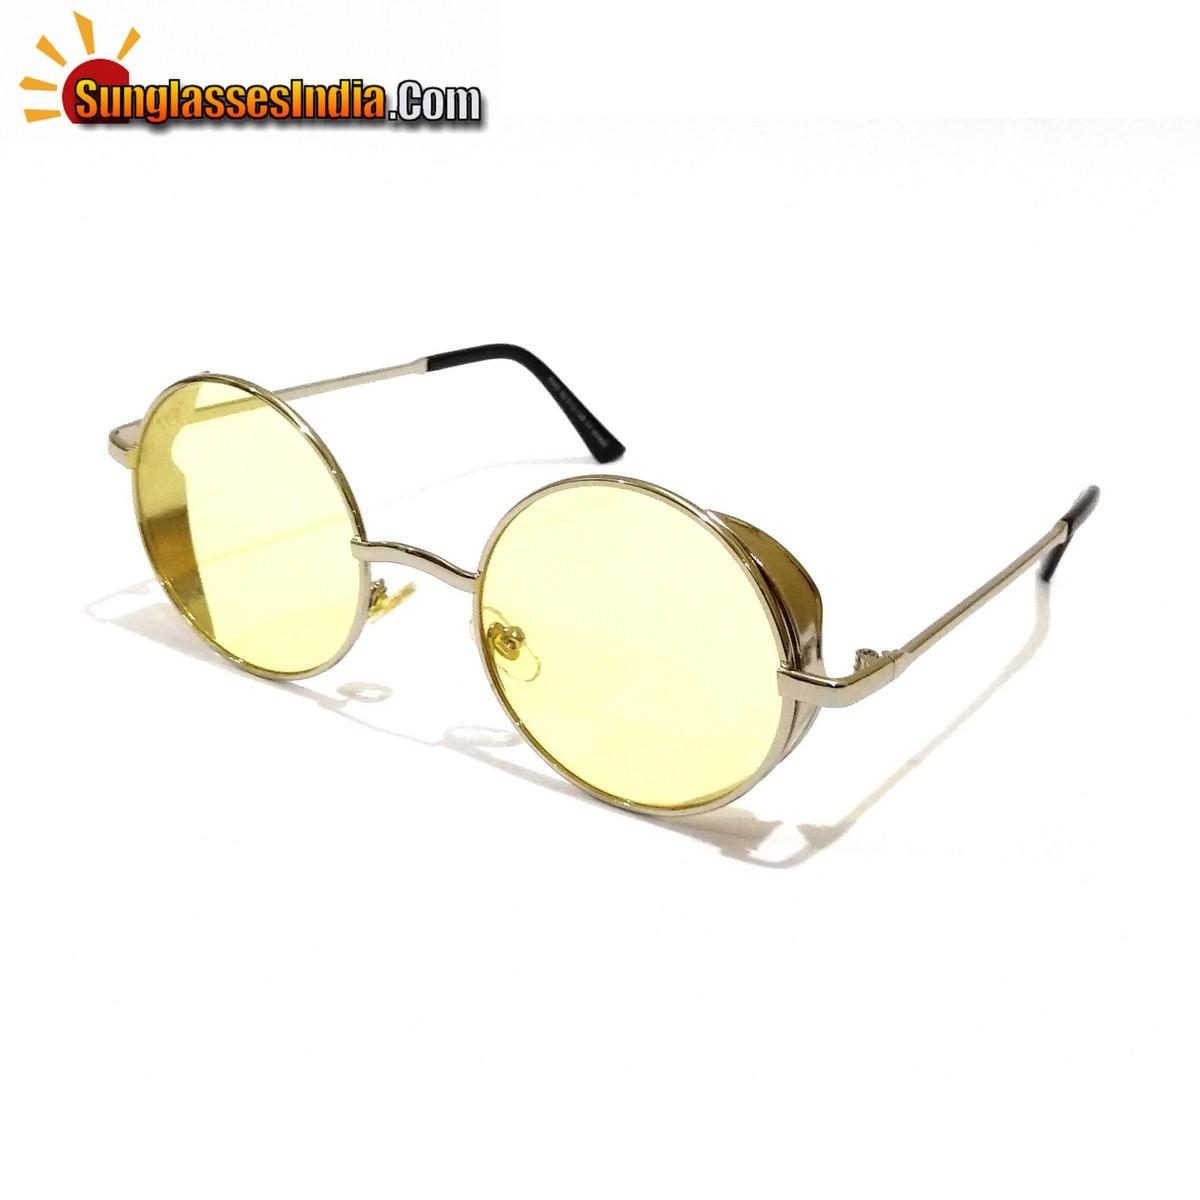 Round Club Sunglasses Night Driving Sunglasses Tik Tok Video Sunglasses